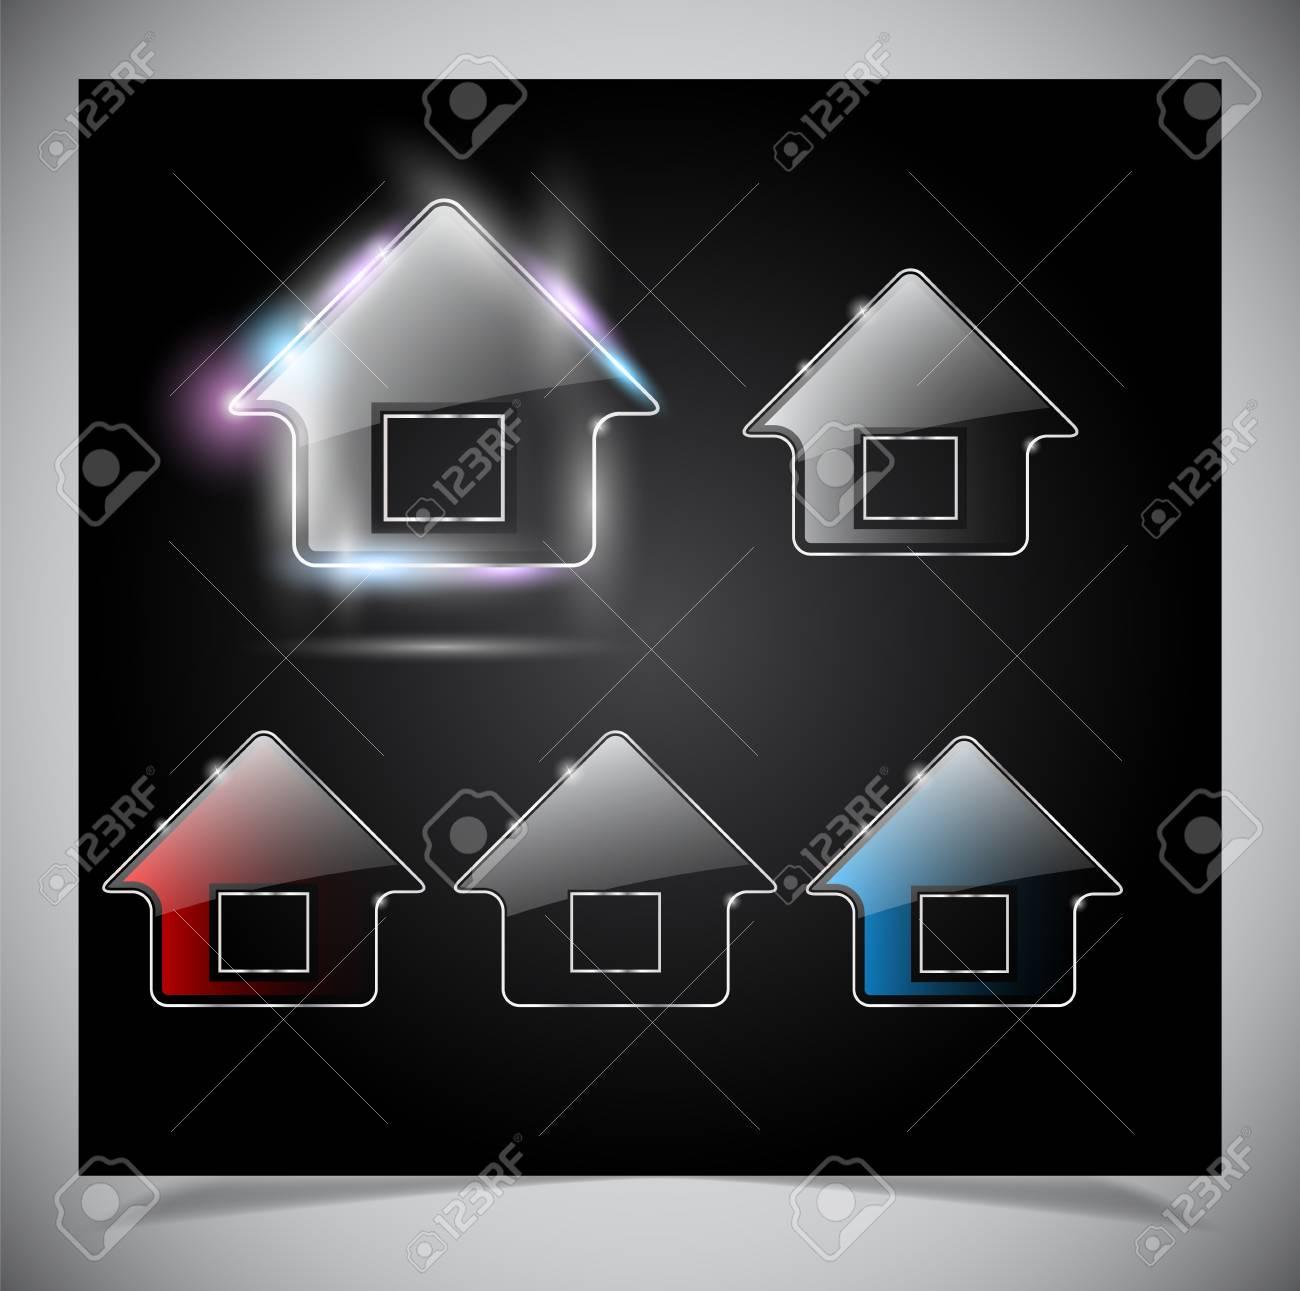 Glass shiny house icon Stock Vector - 15315272